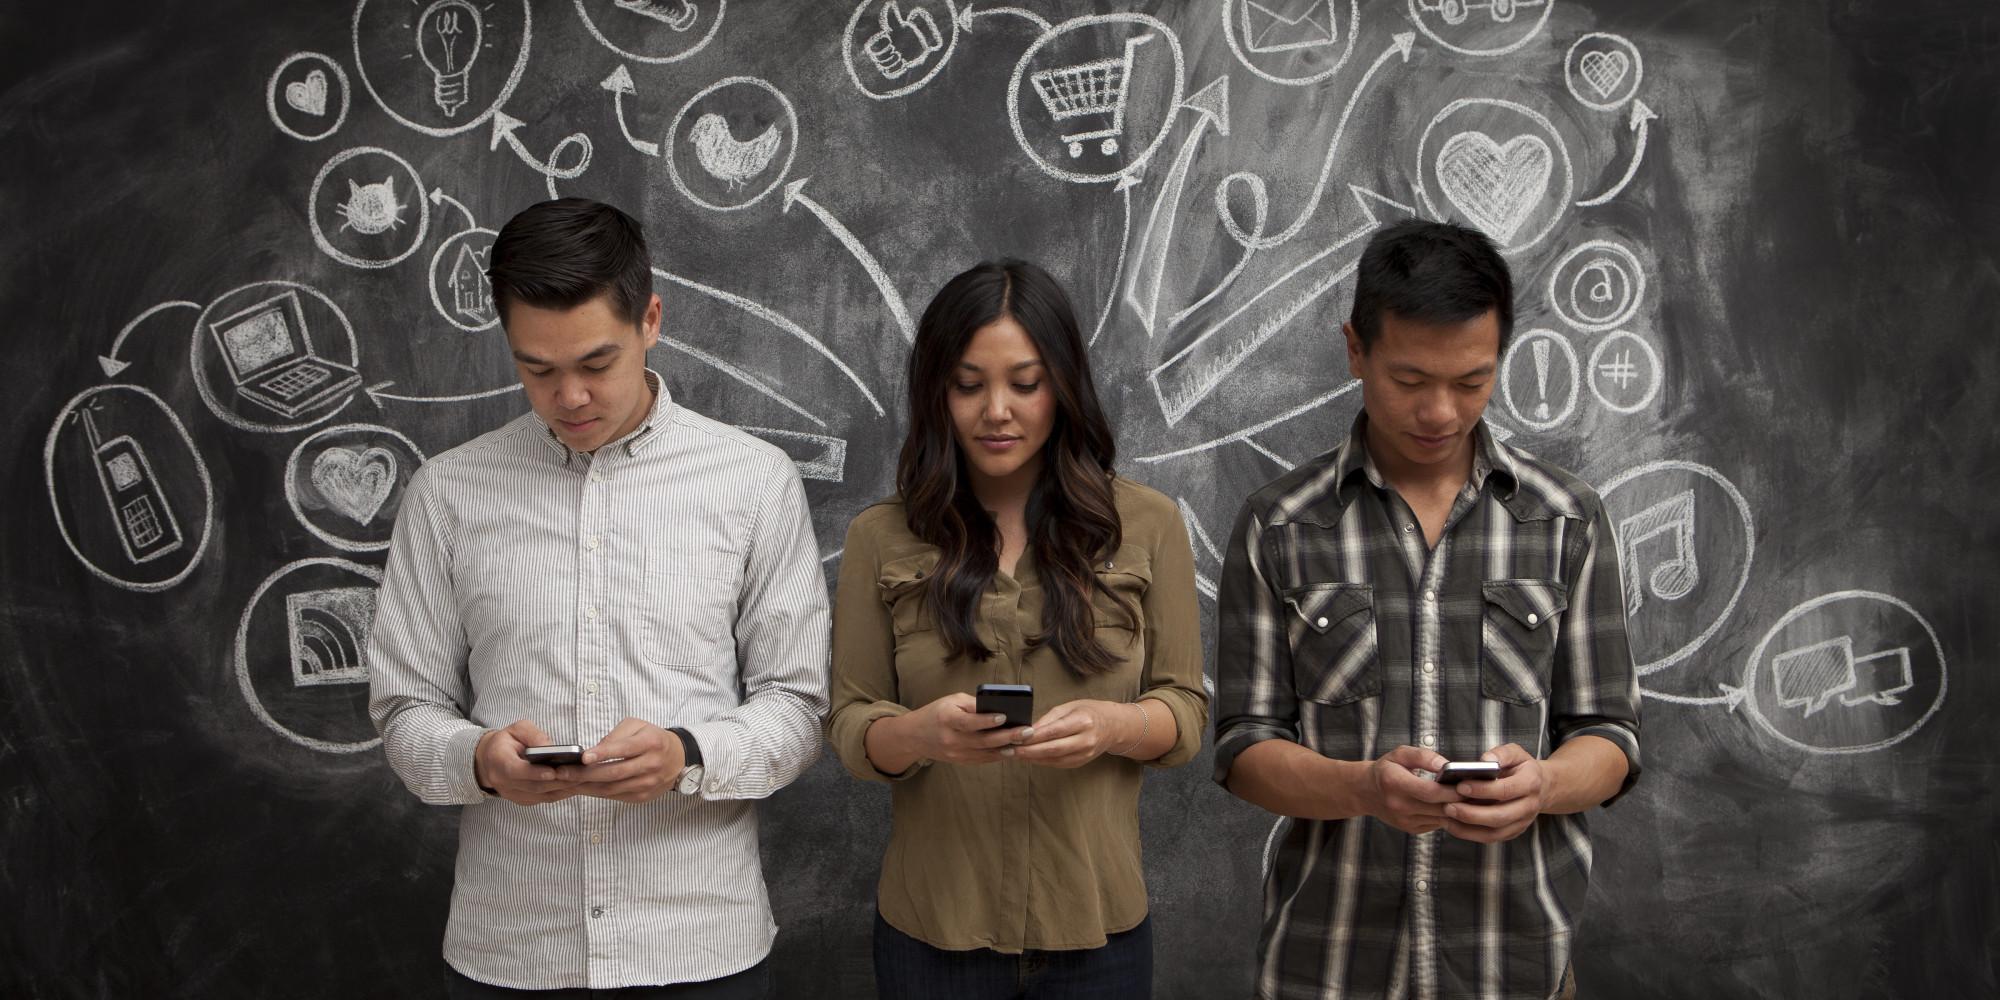 internet dating positives and negatives